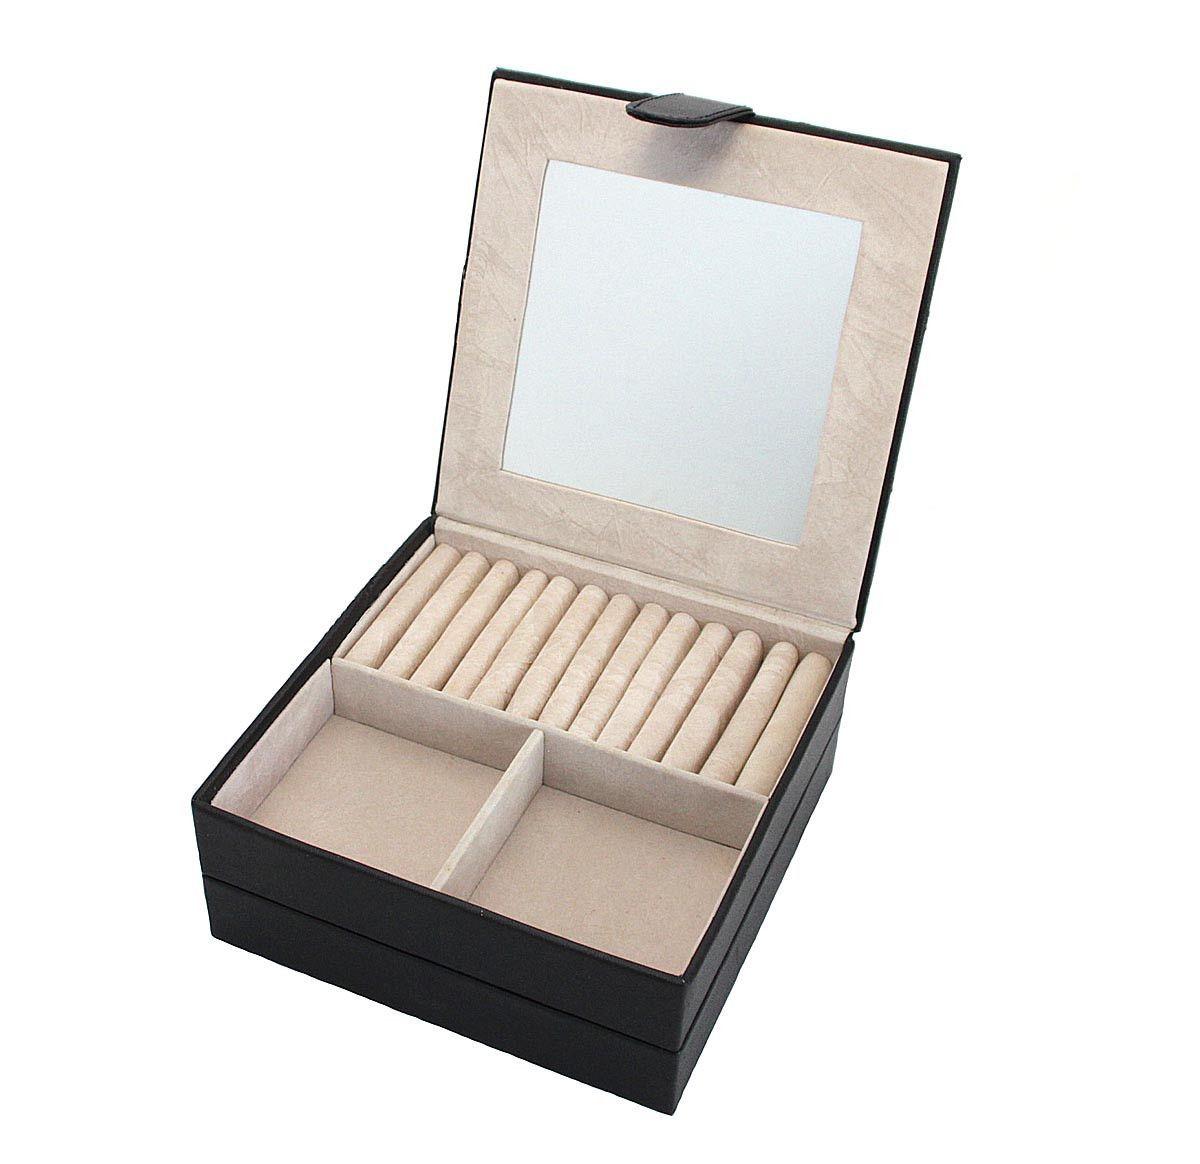 Jewelry box black bedroom pinterest box jewellery